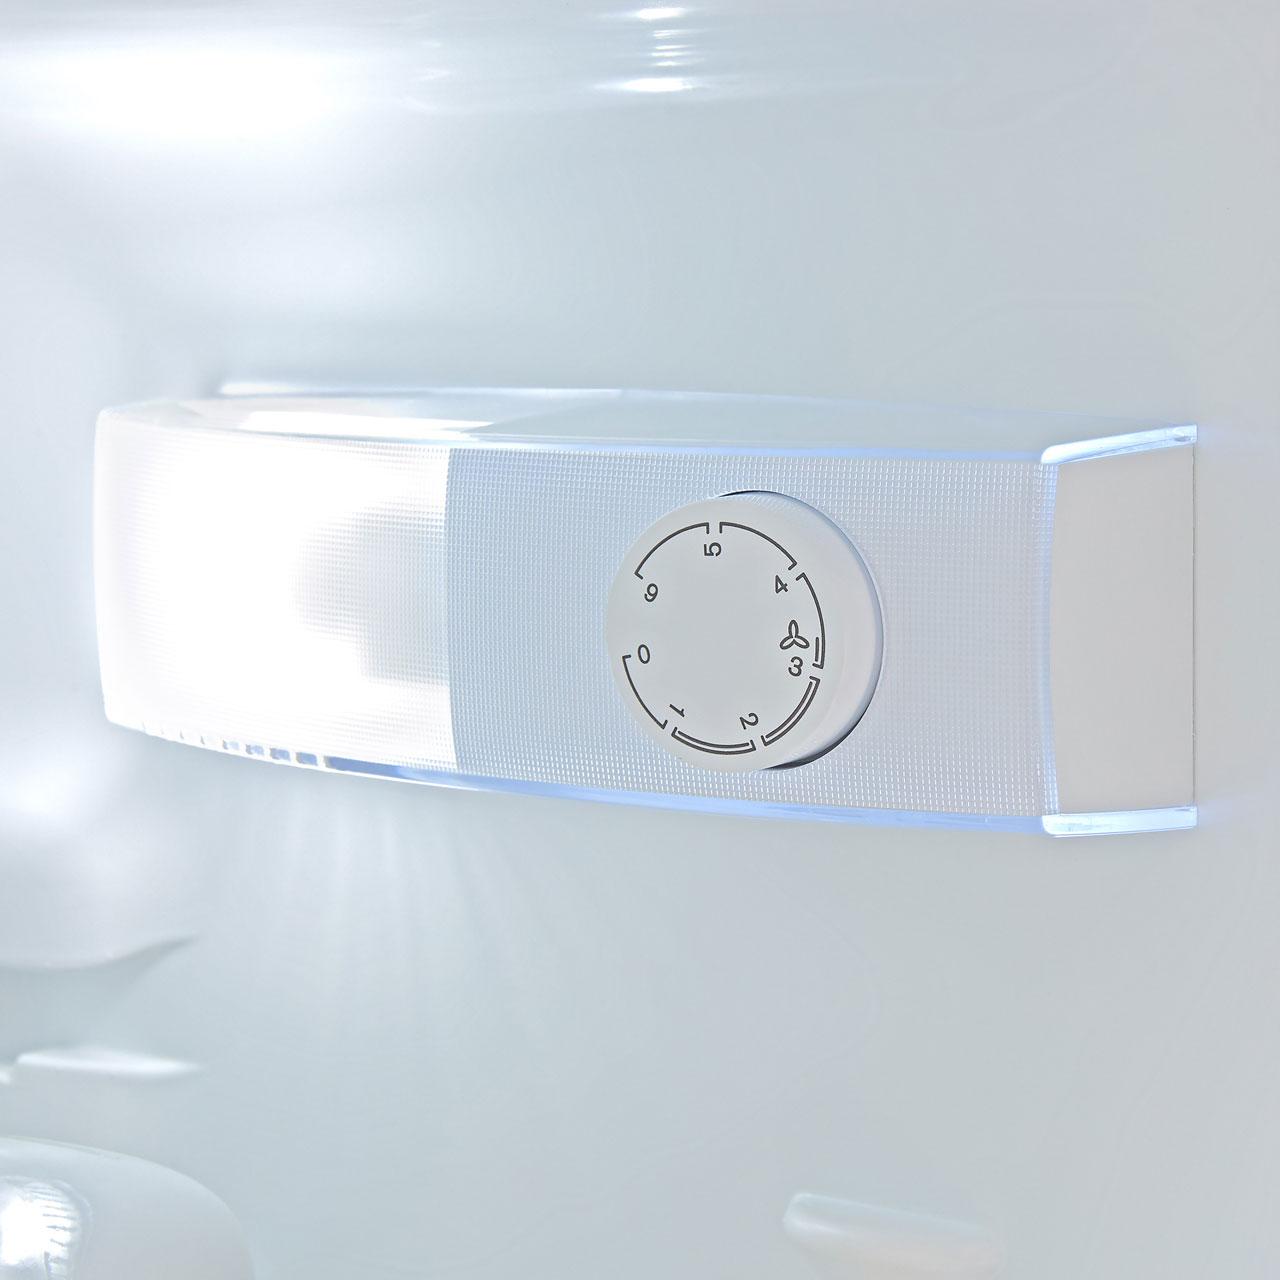 Zanussi ZBB24431SV Integrated 70/30 Fridge Freezer with Sliding Door Fixing  Kit - White - A+ Rated